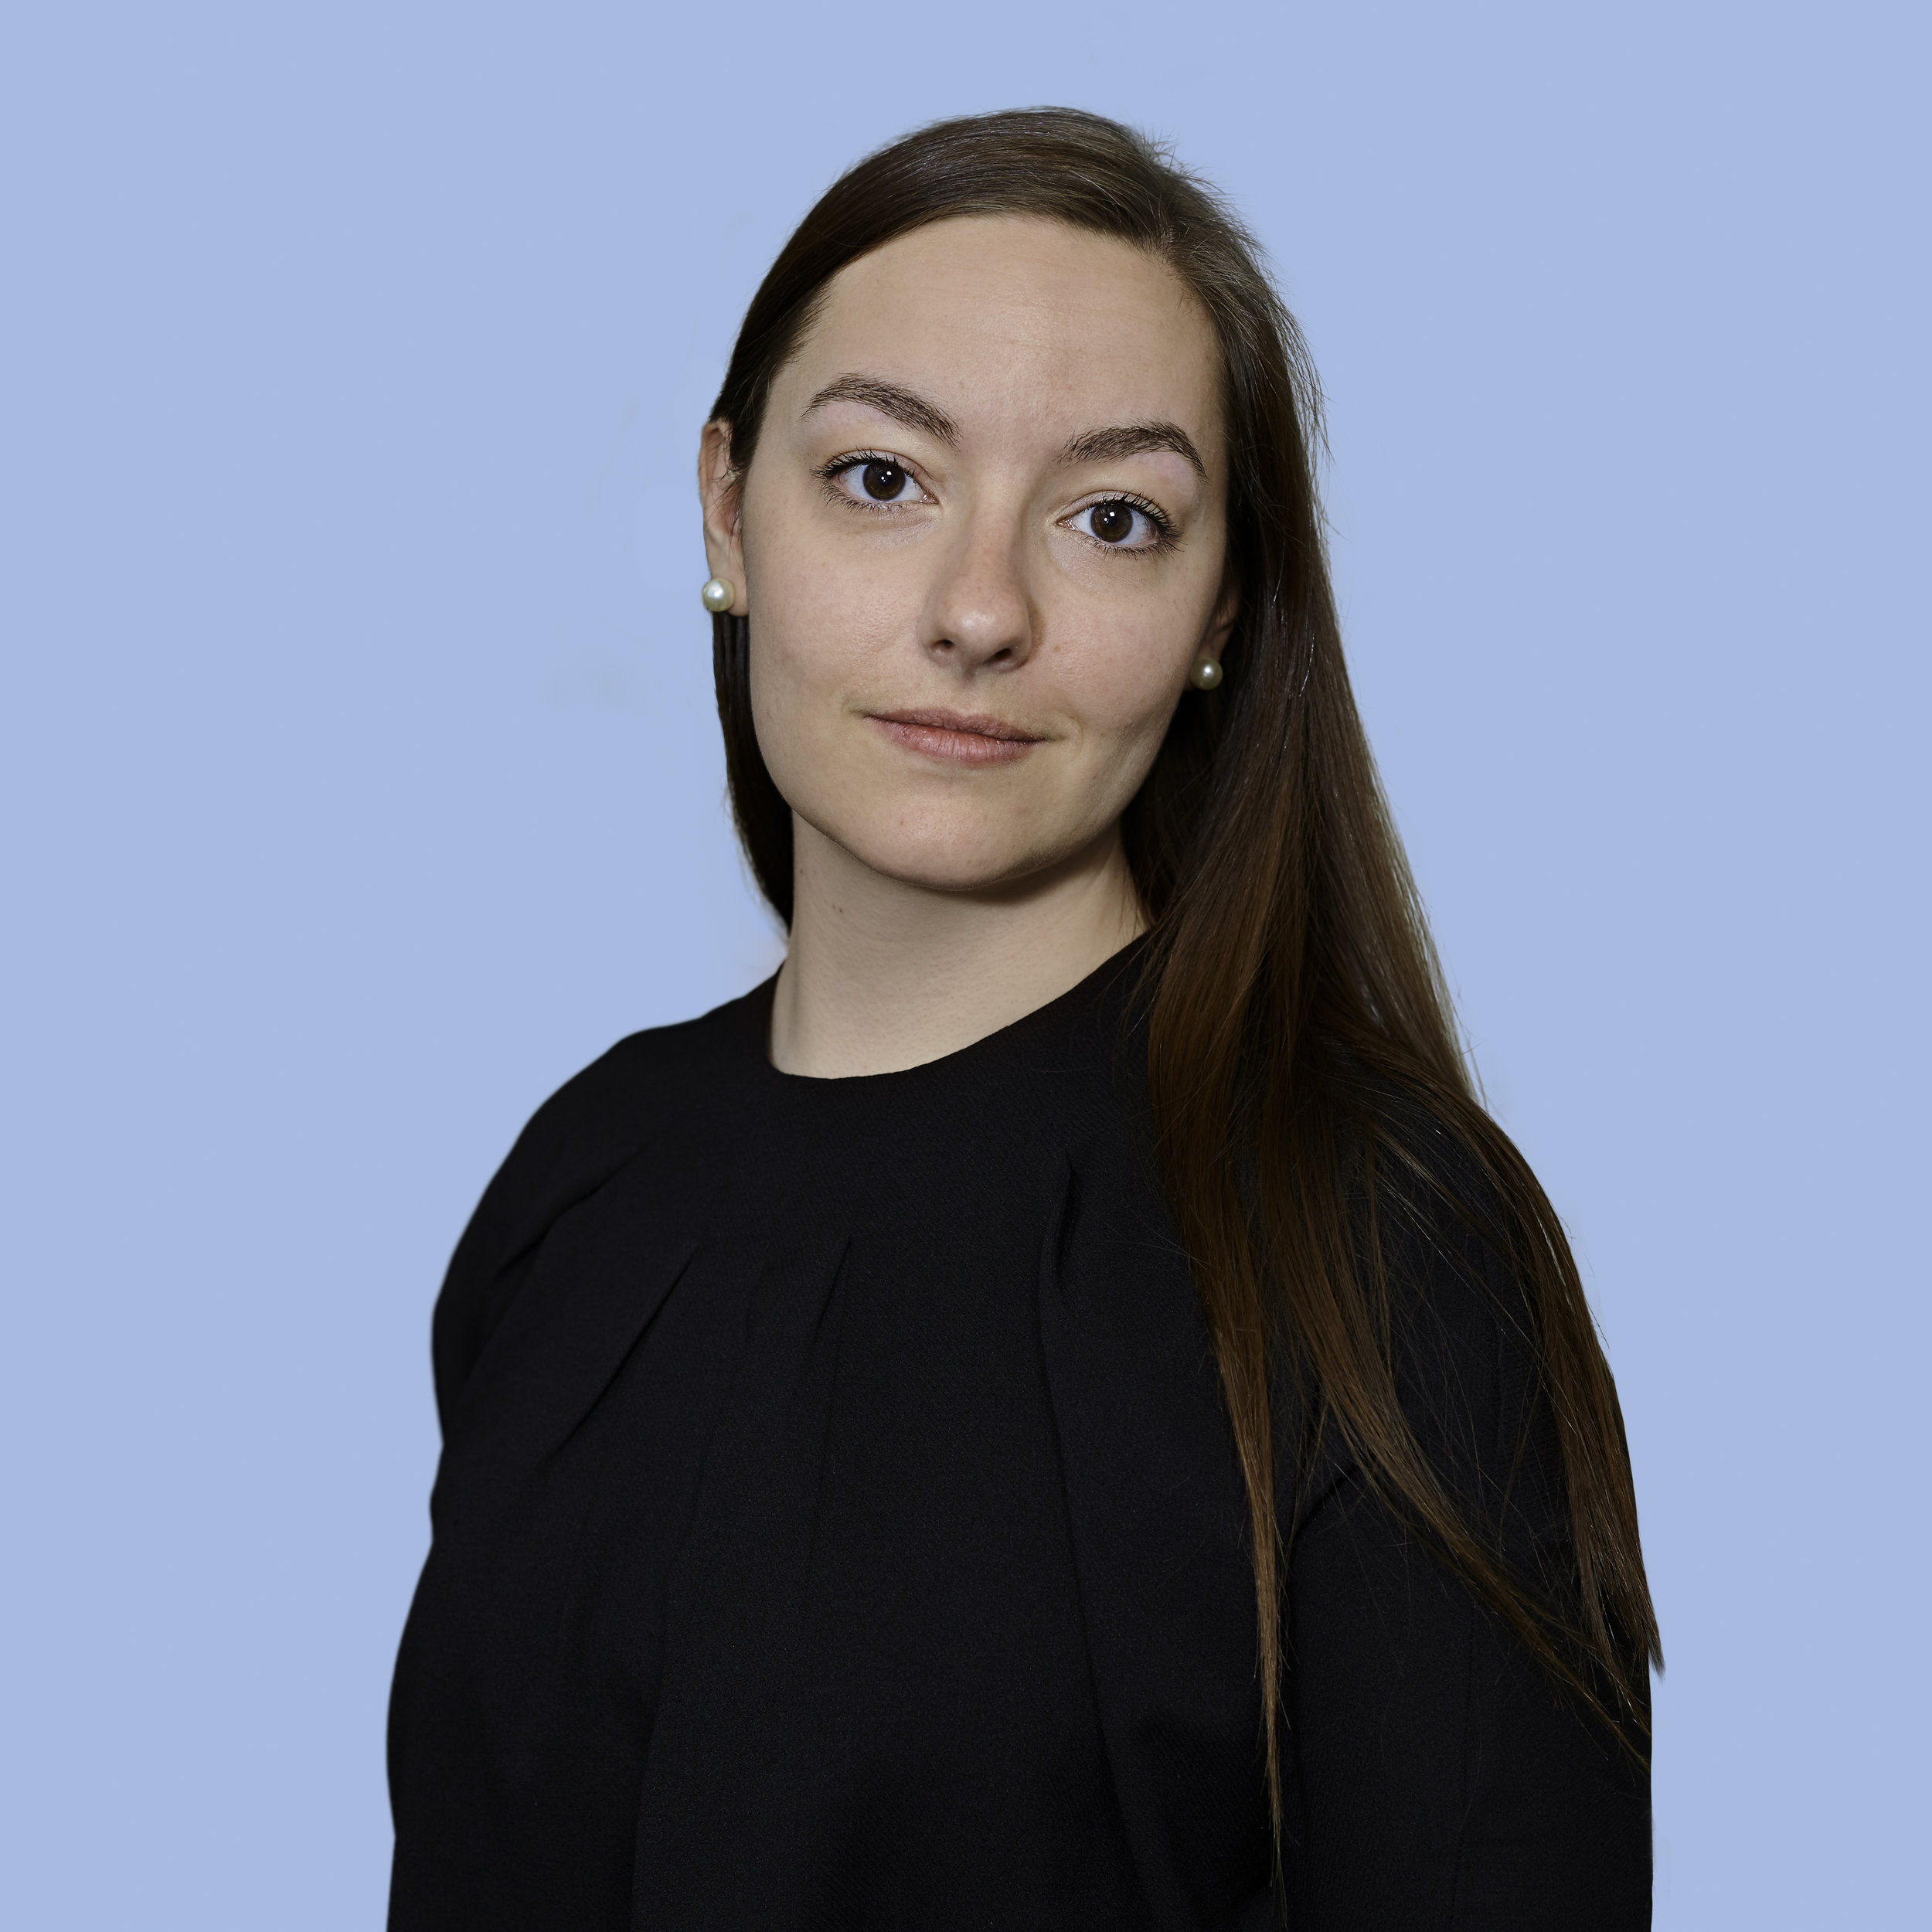 Mariel svala - Administrativ koordinatormariel@aviaprod.noTlf: 92863705